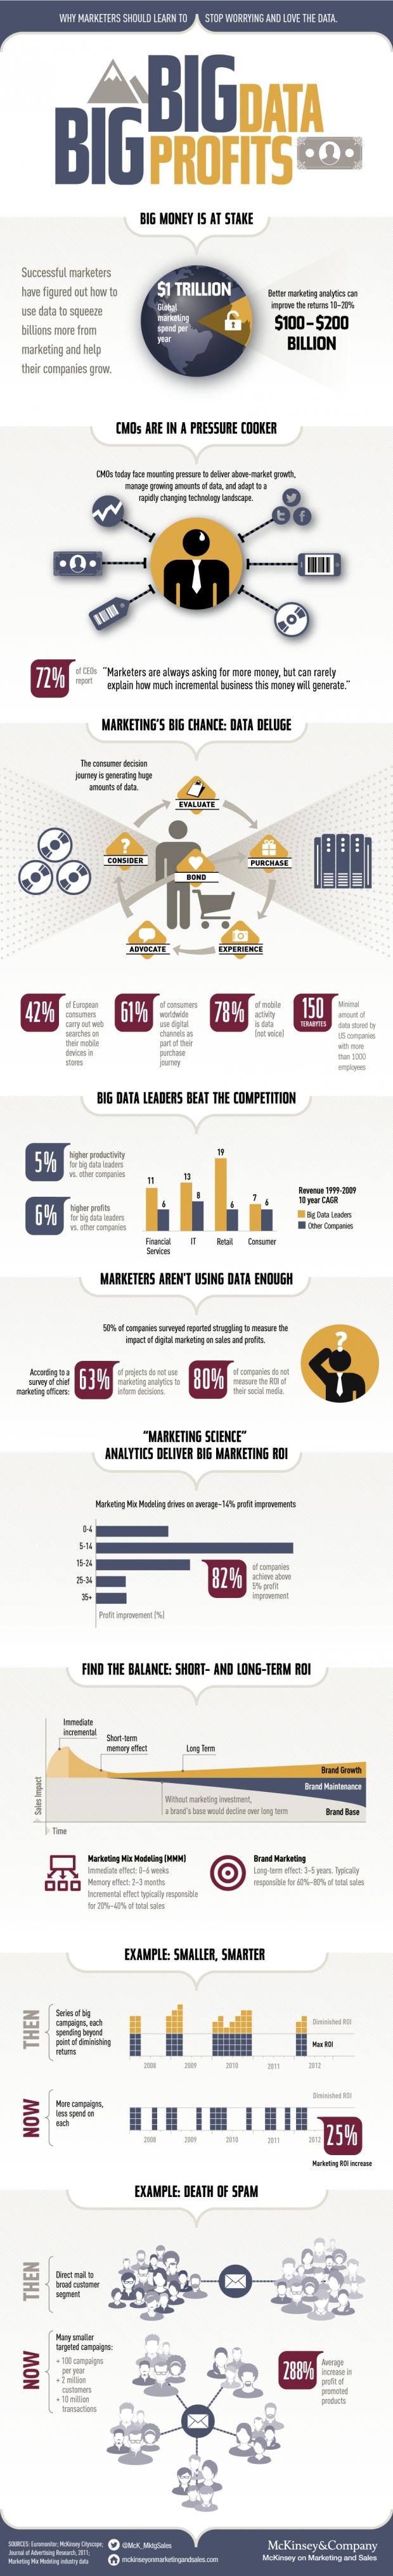 Big Data for Big Profits